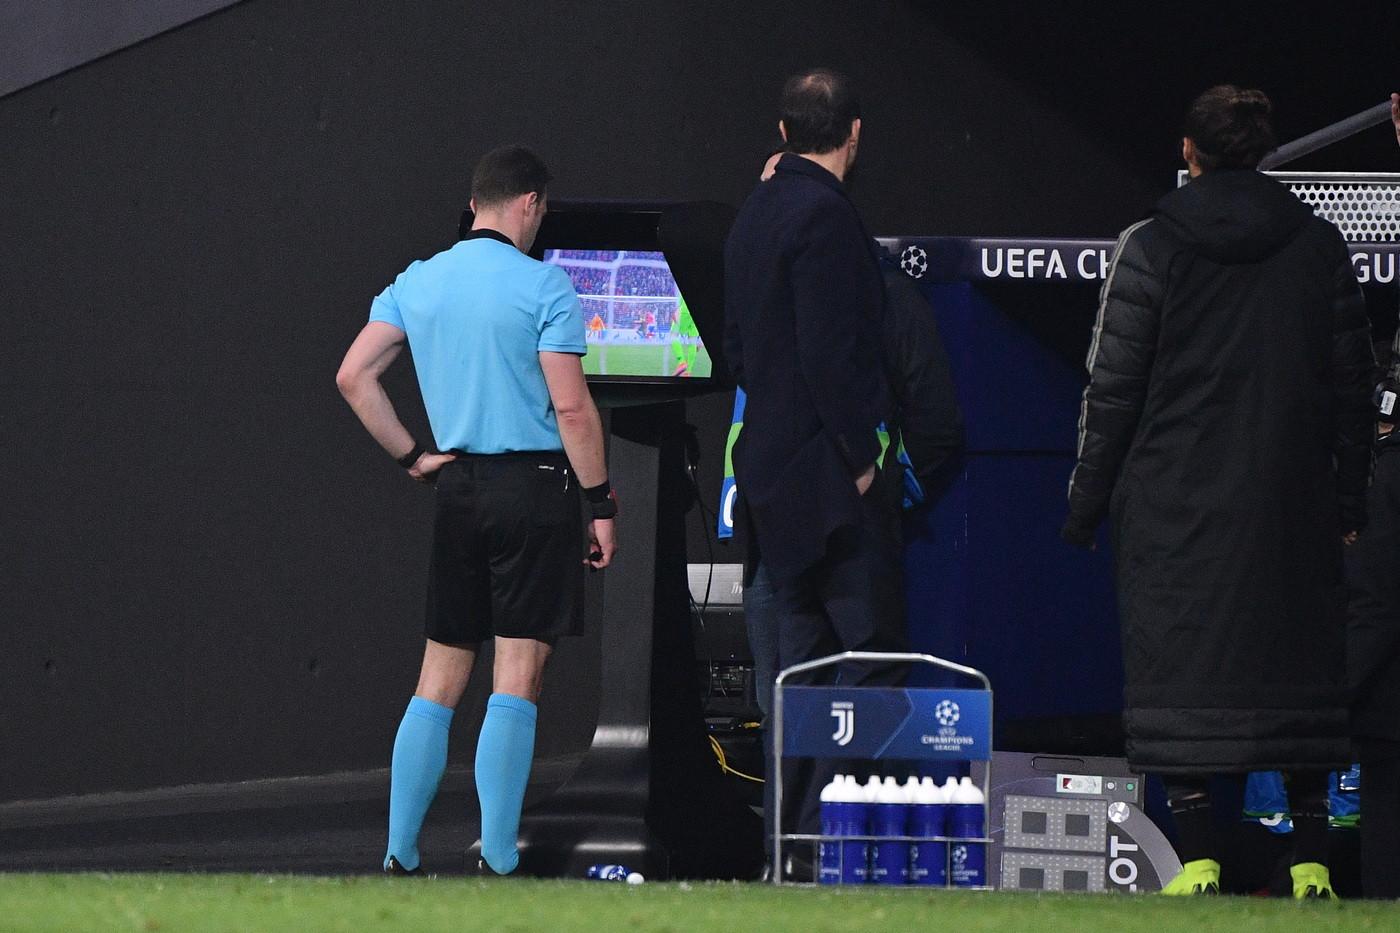 uefa-konfirmon-ndryshim-kyc-be-var-per-ndeshjen-sevilla-chelsea